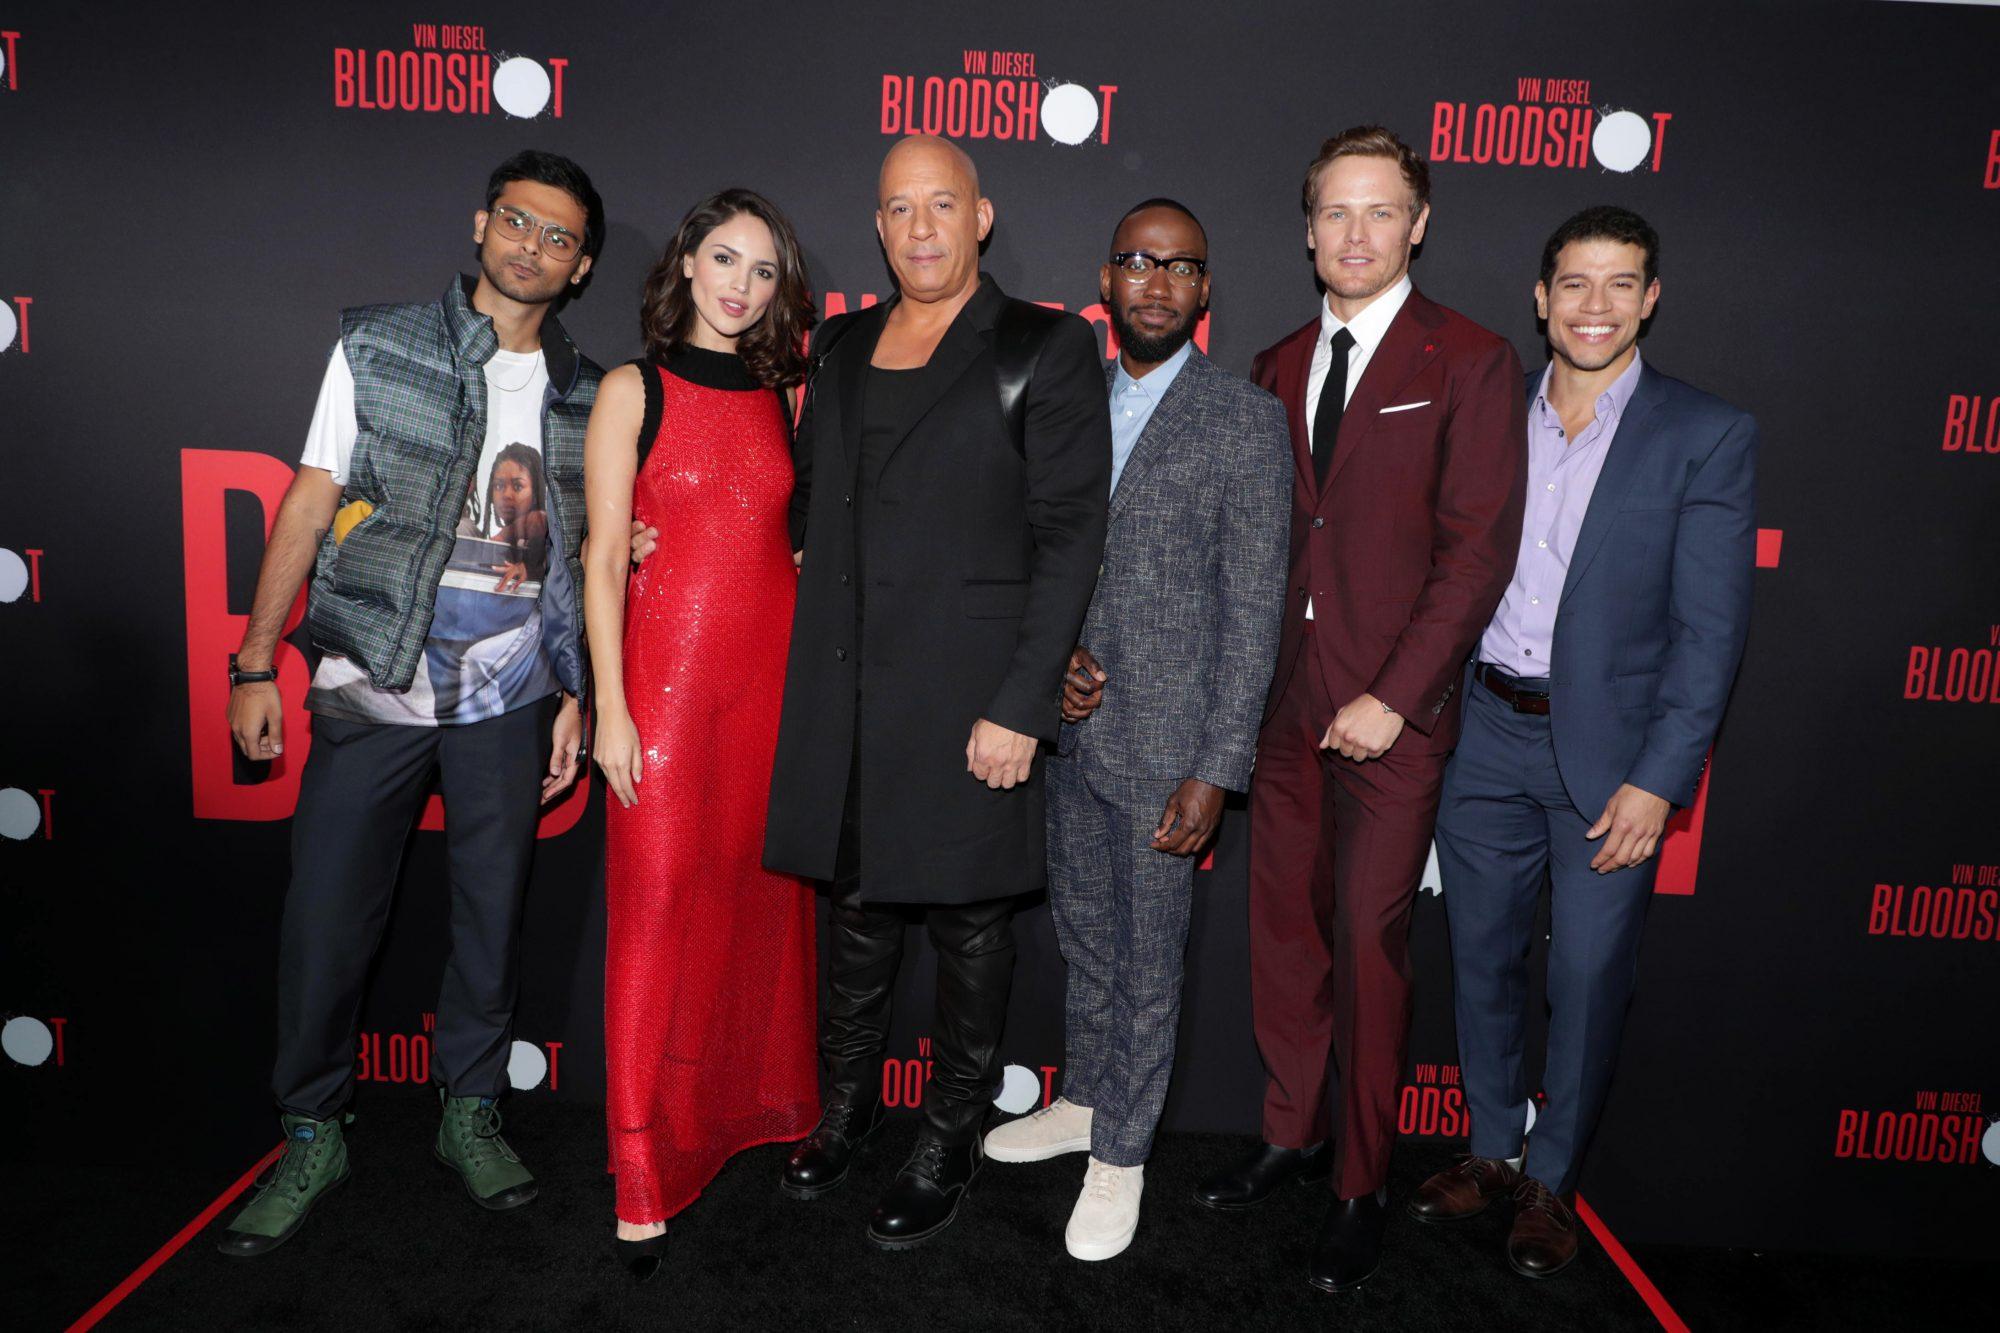 El elenco de Bloodshot